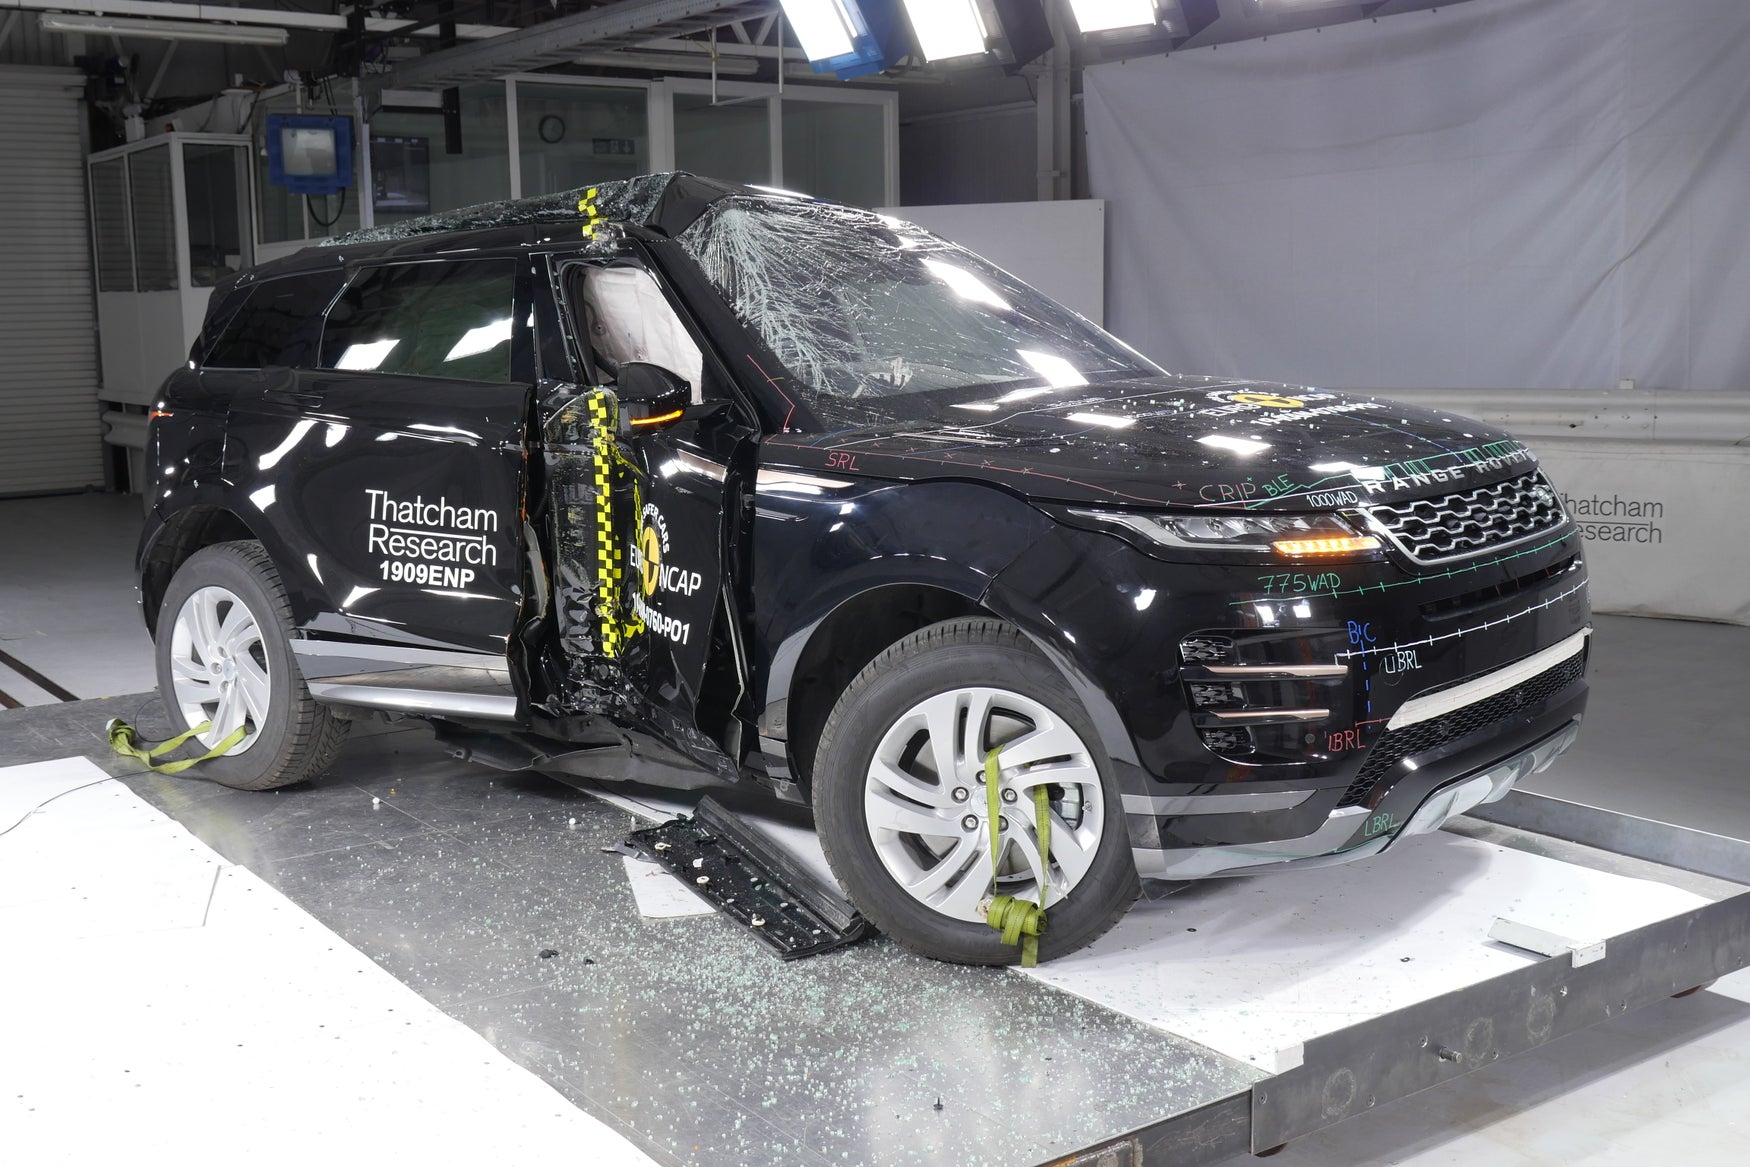 Range Rover Evoque Euro NCAP crash test